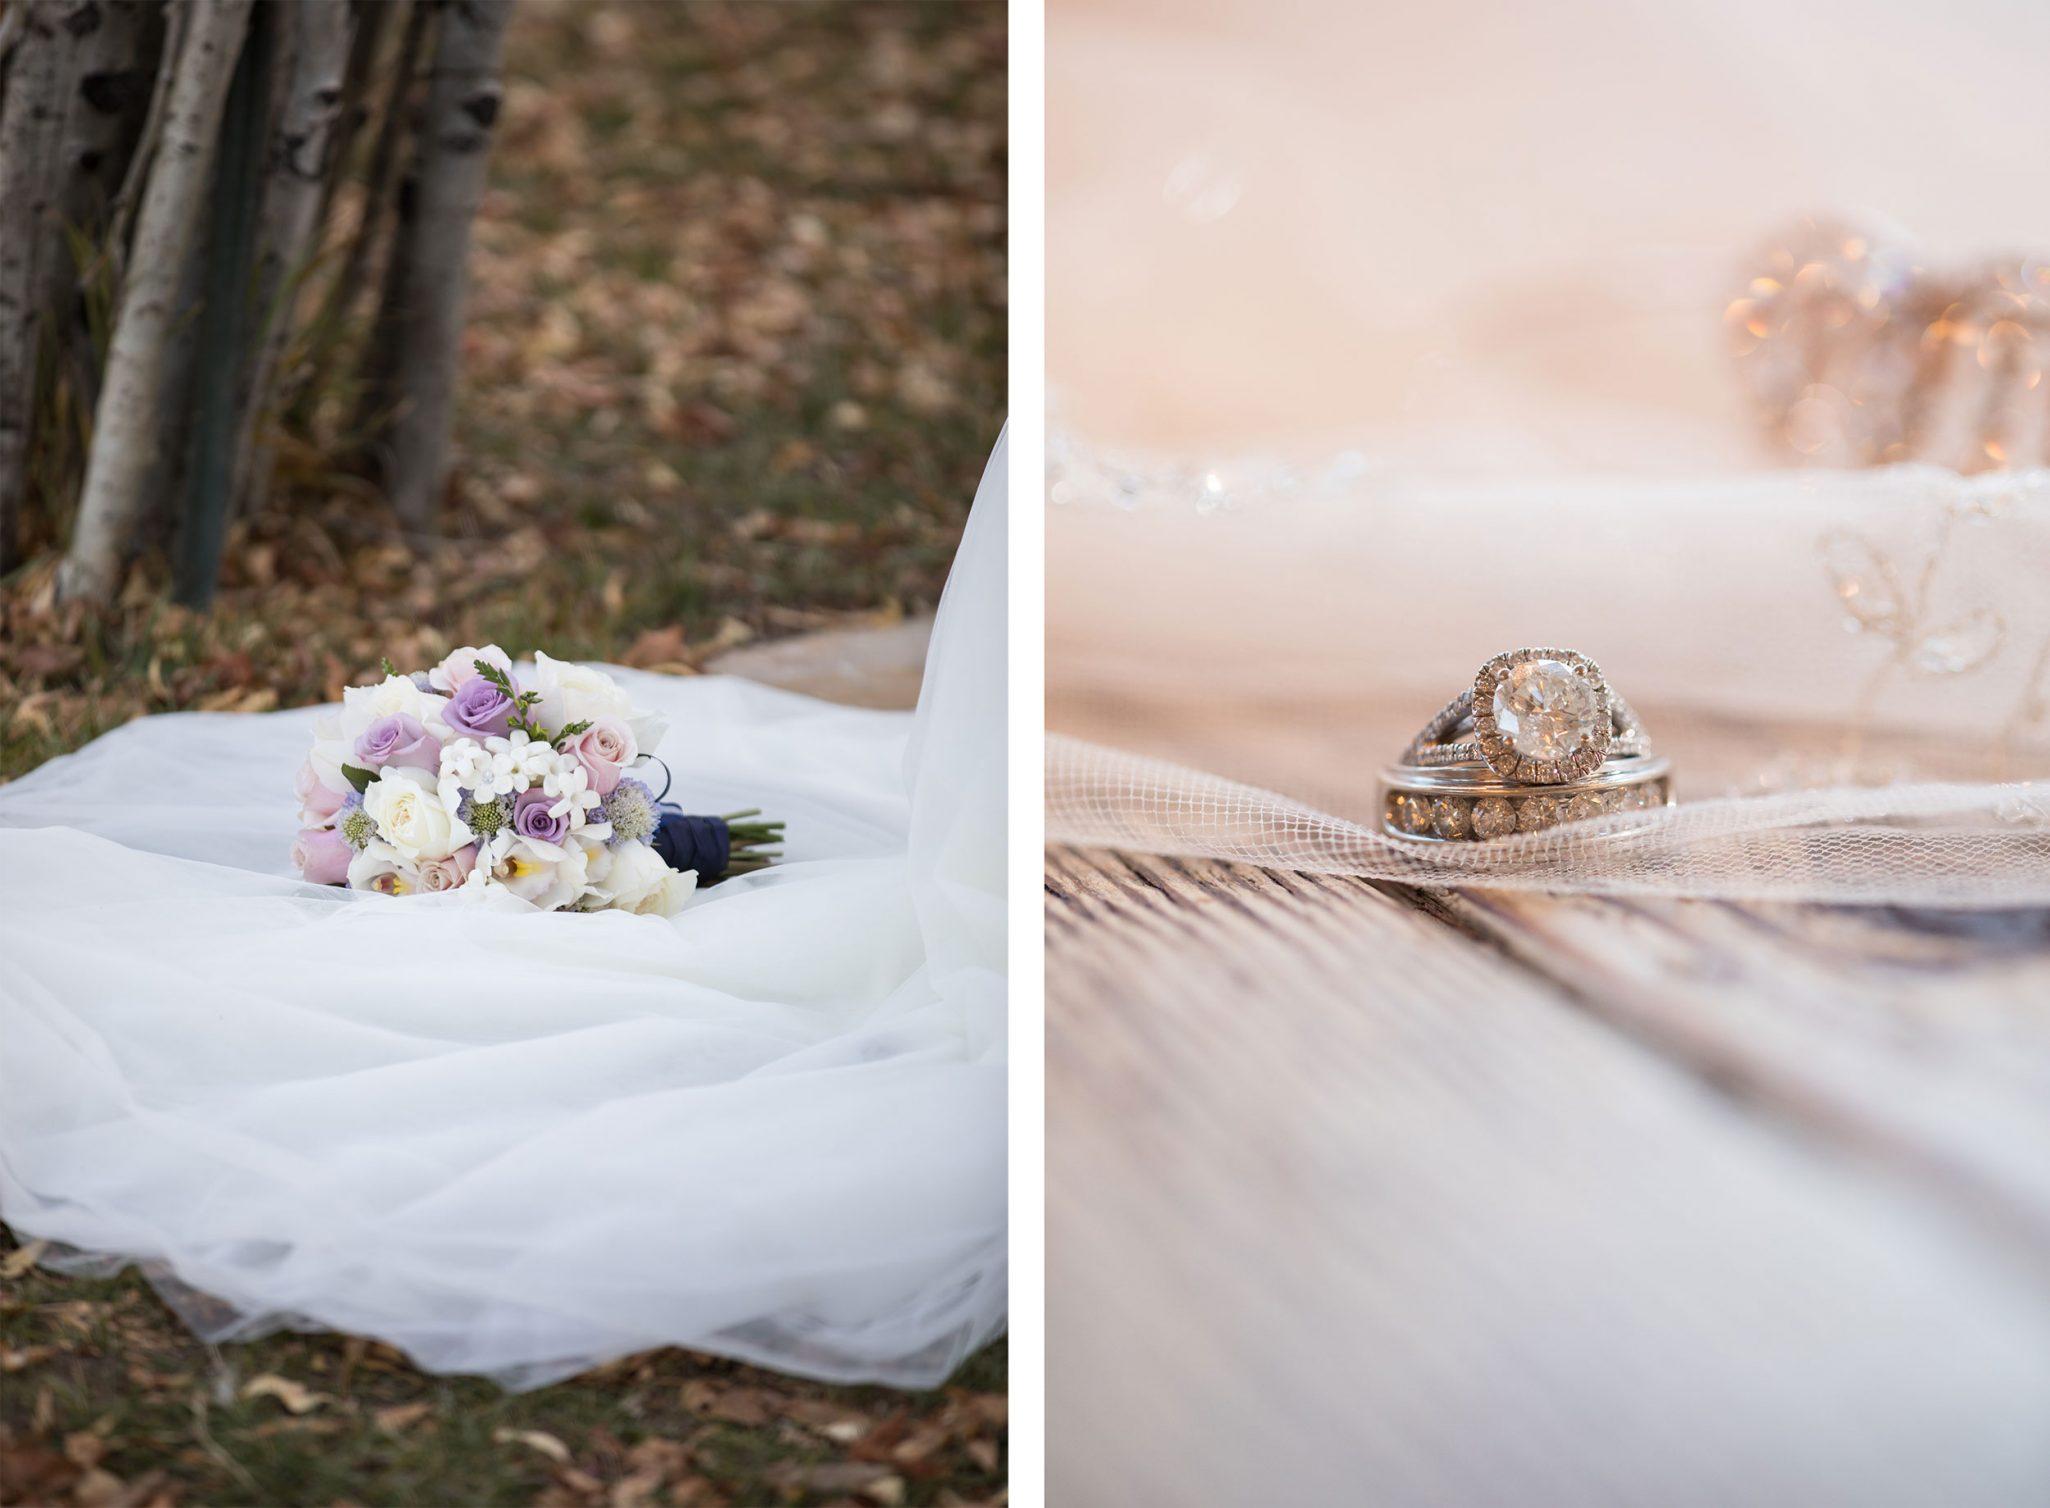 Wedding bouquet & ring